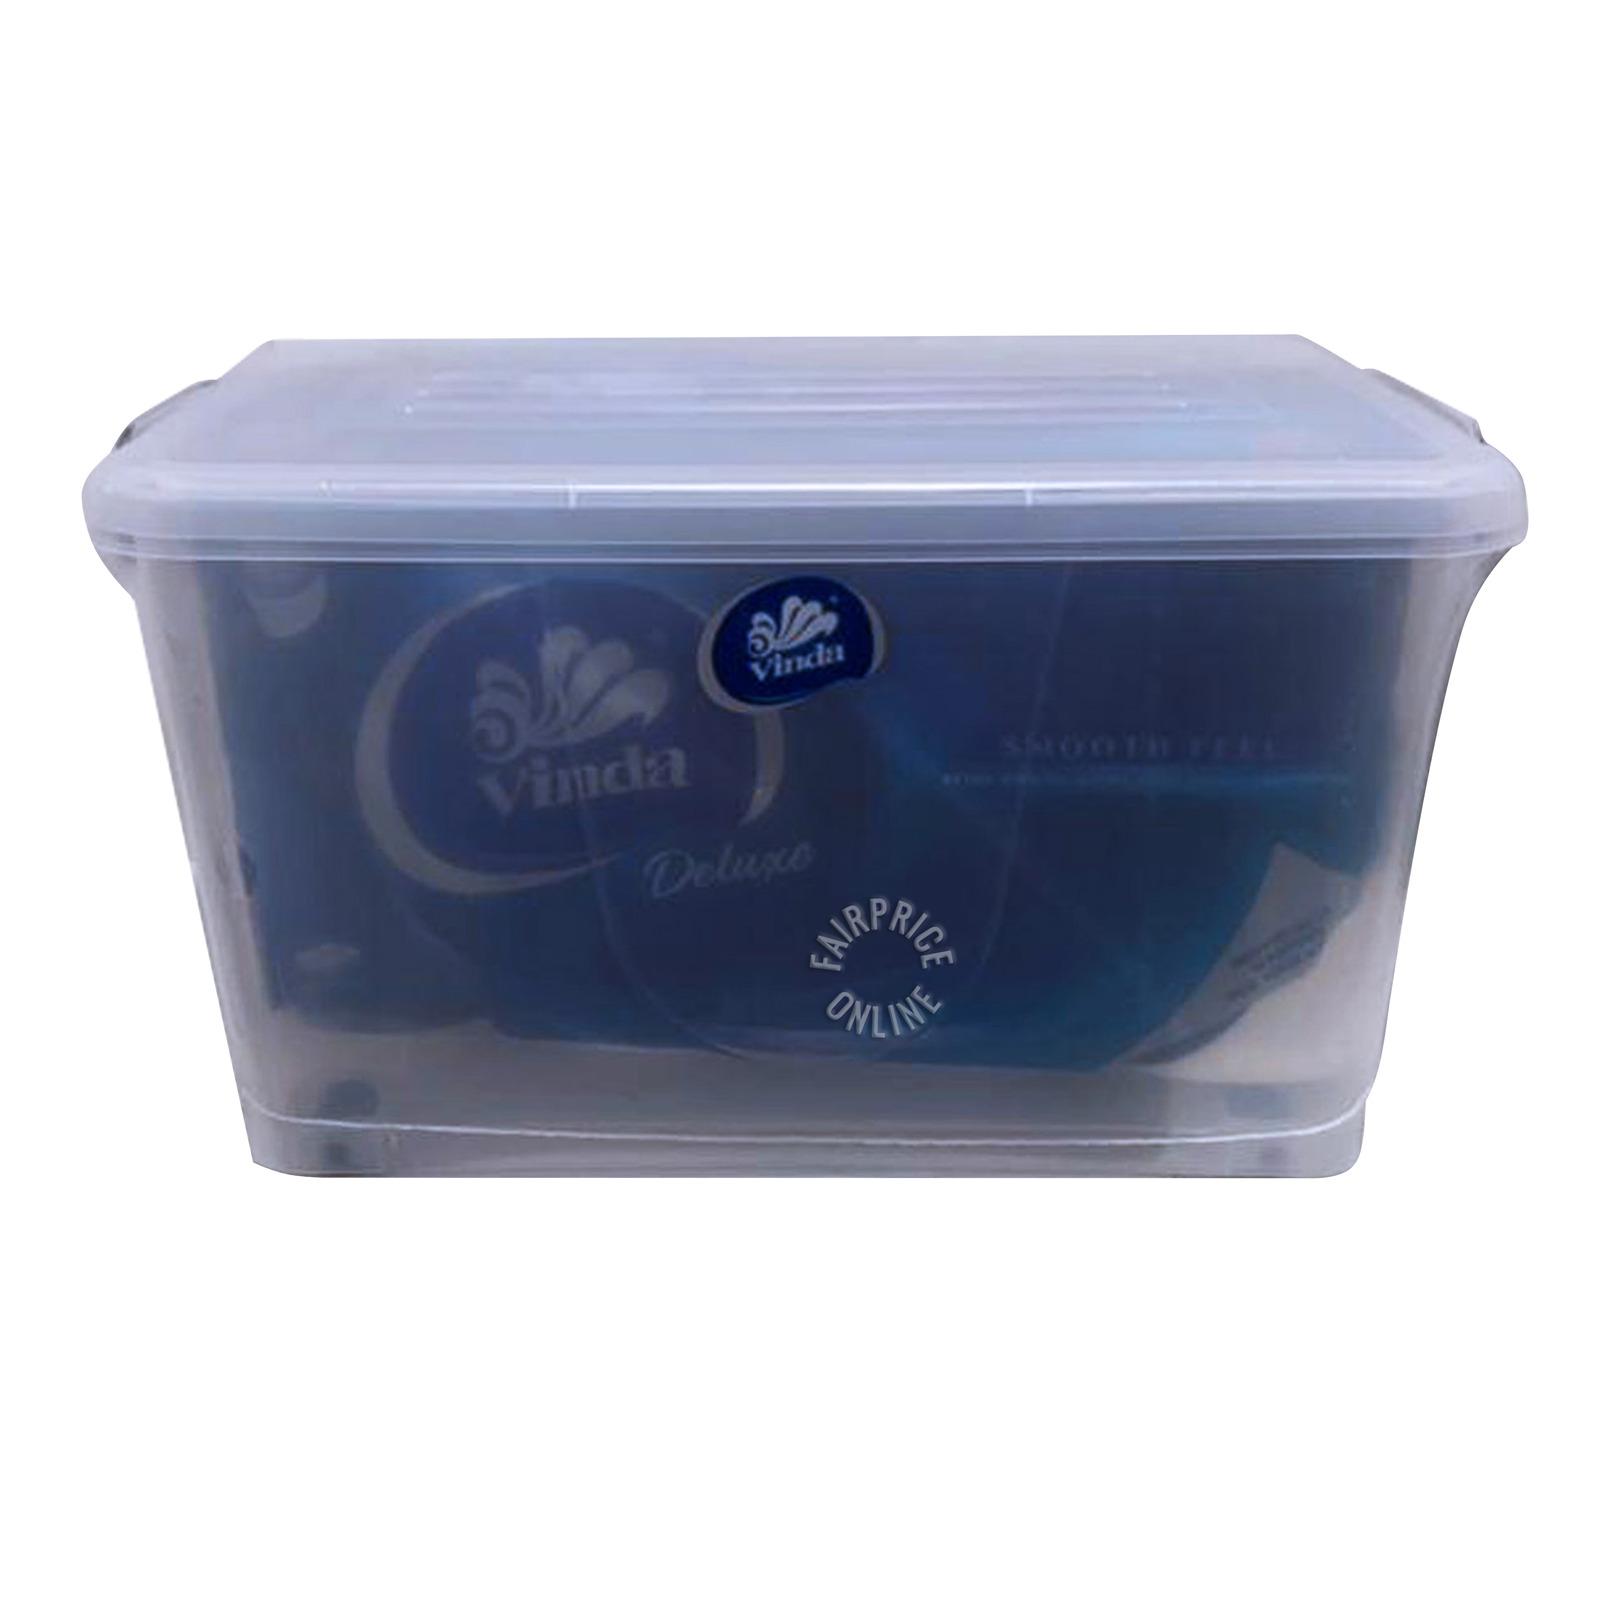 Vinda Deluxe Smooth Feel Toilet Tissue - 3 Ply